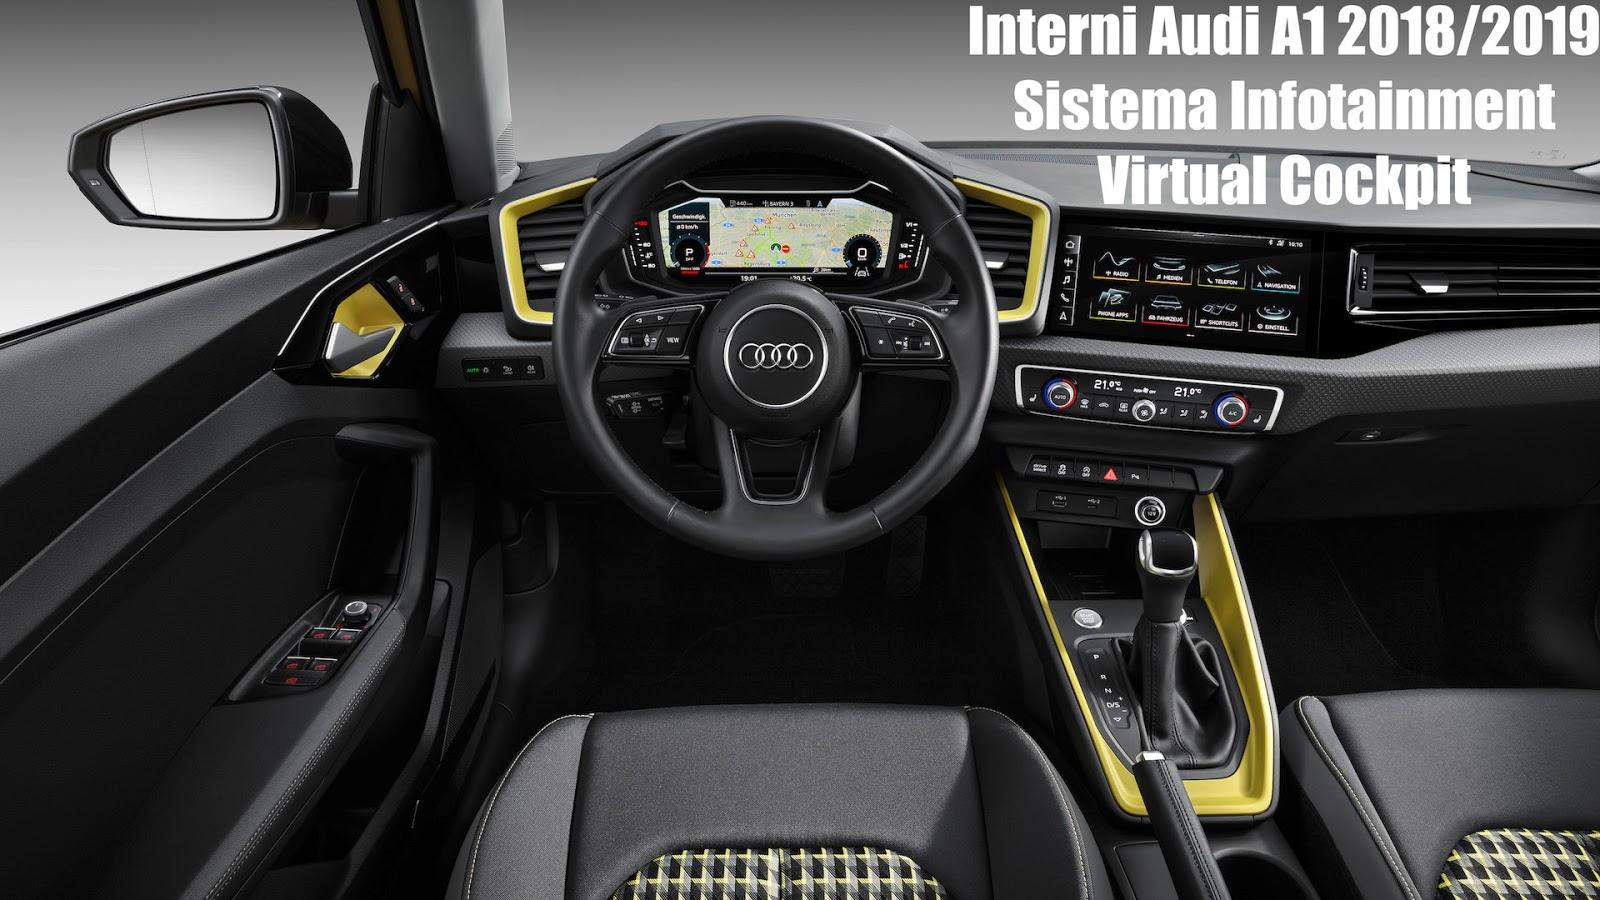 interni audi ai 2019, infotainment e virtual cockpit digitale